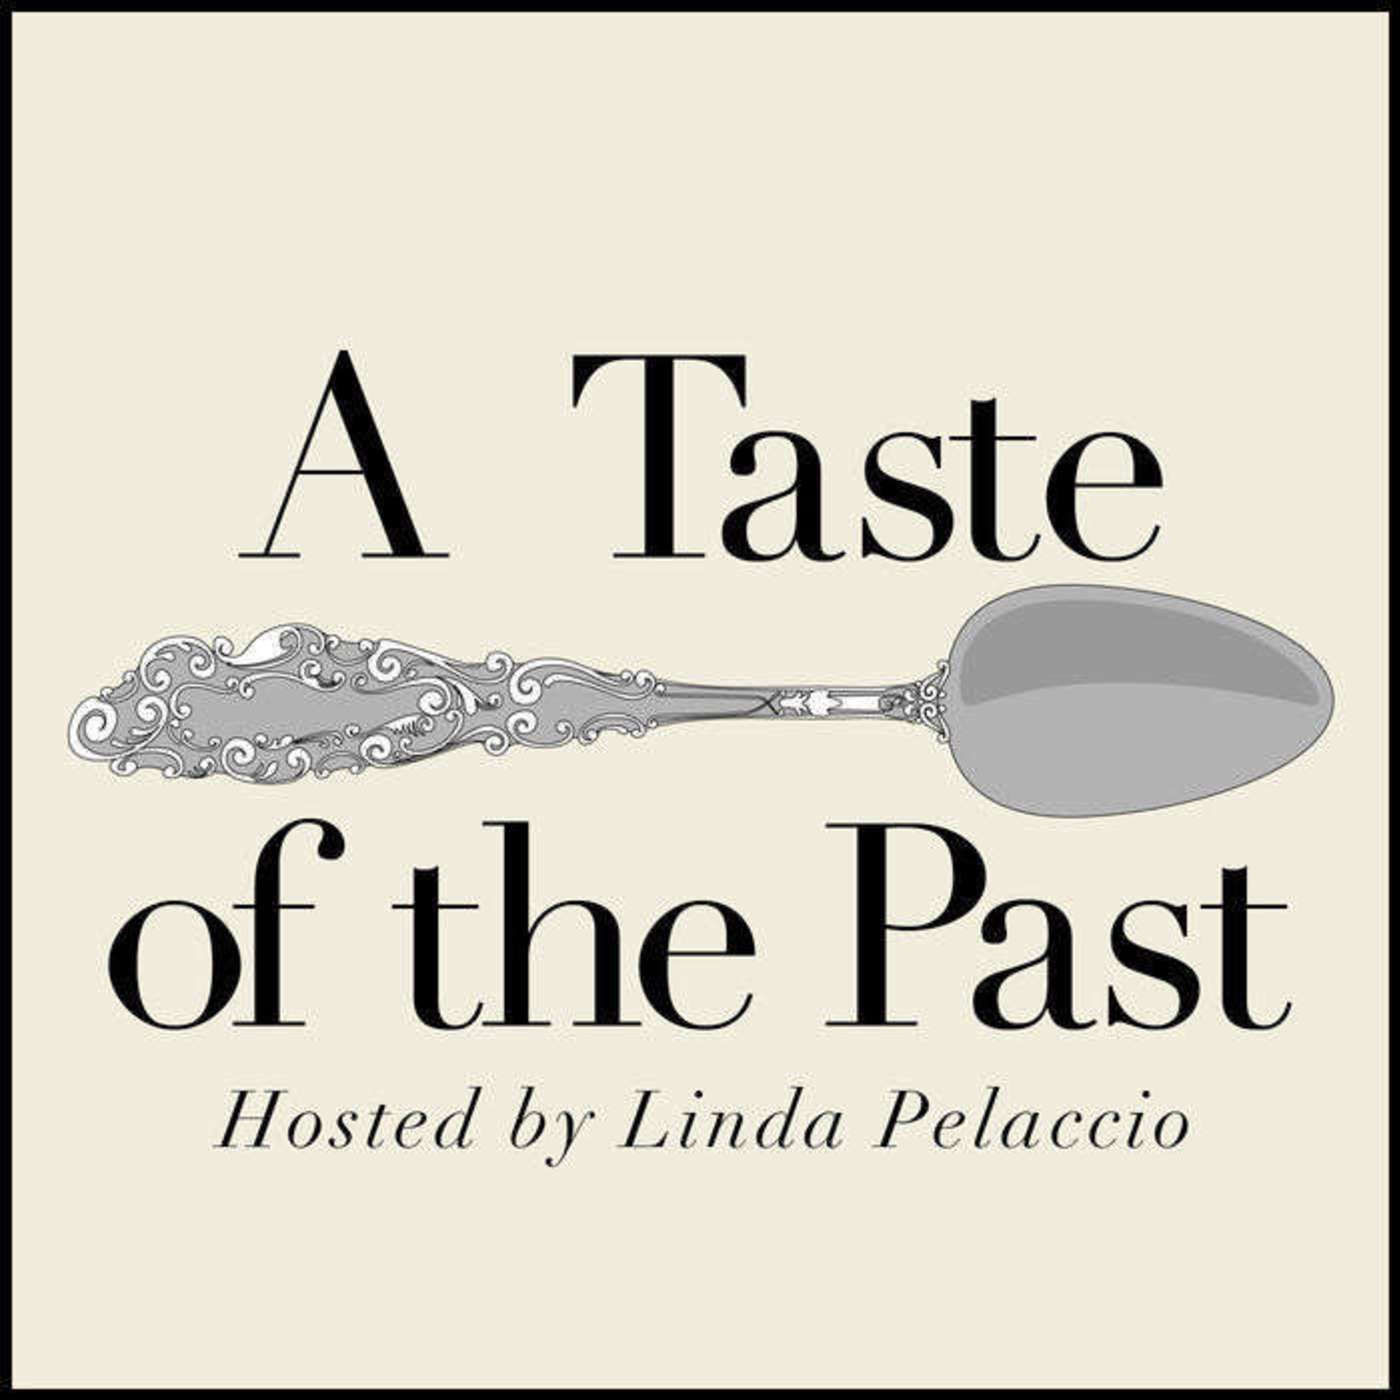 Episode 38: Wild Food